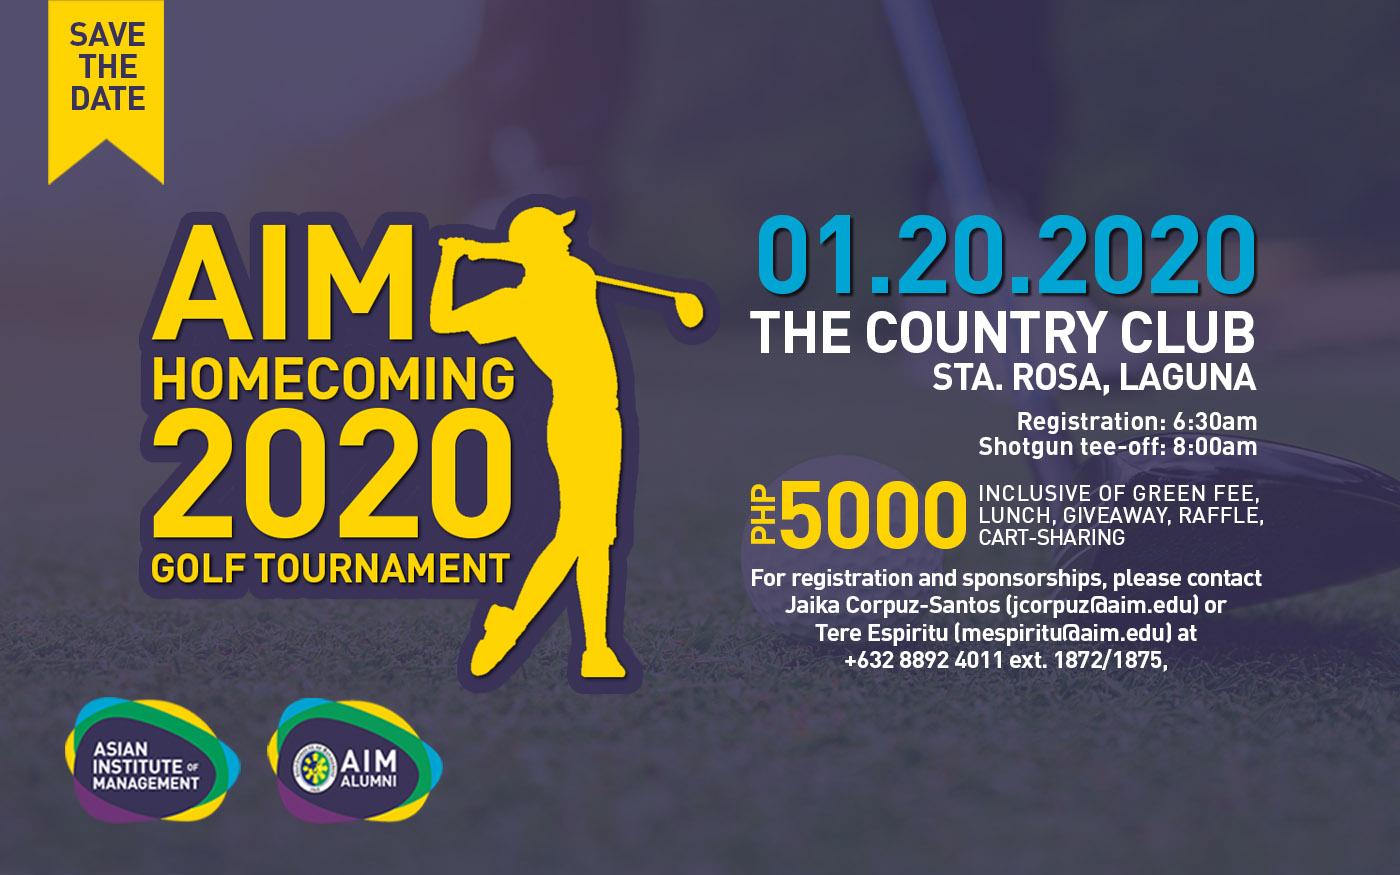 AIM Homecoming 2020 Golf Tournament